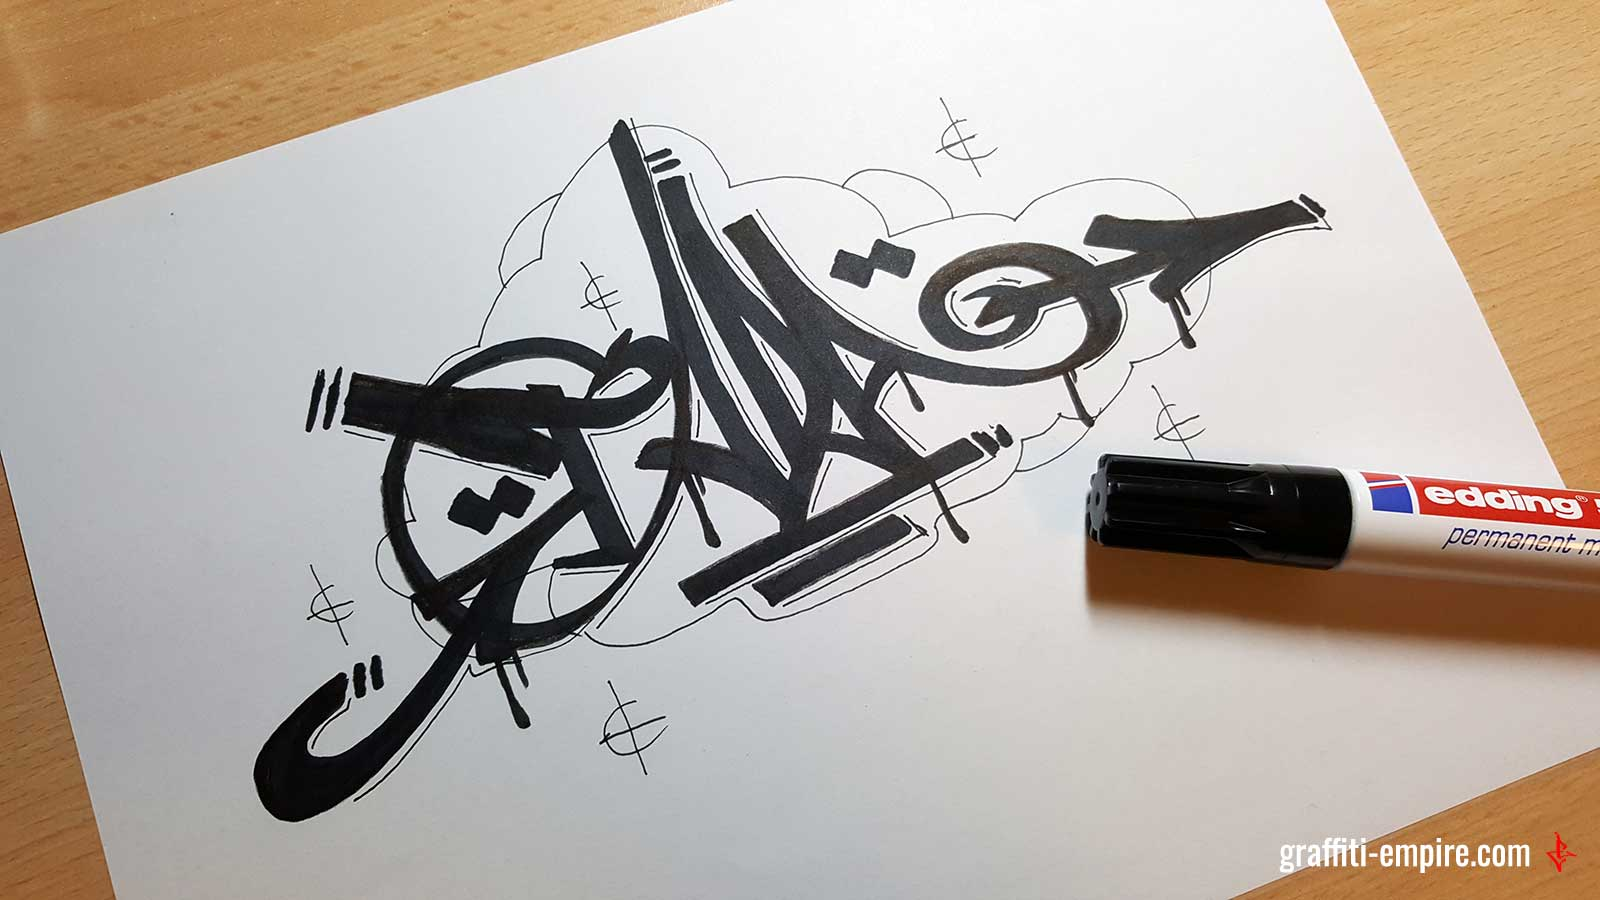 TADA Graffiti Tag by Graffiti Empire